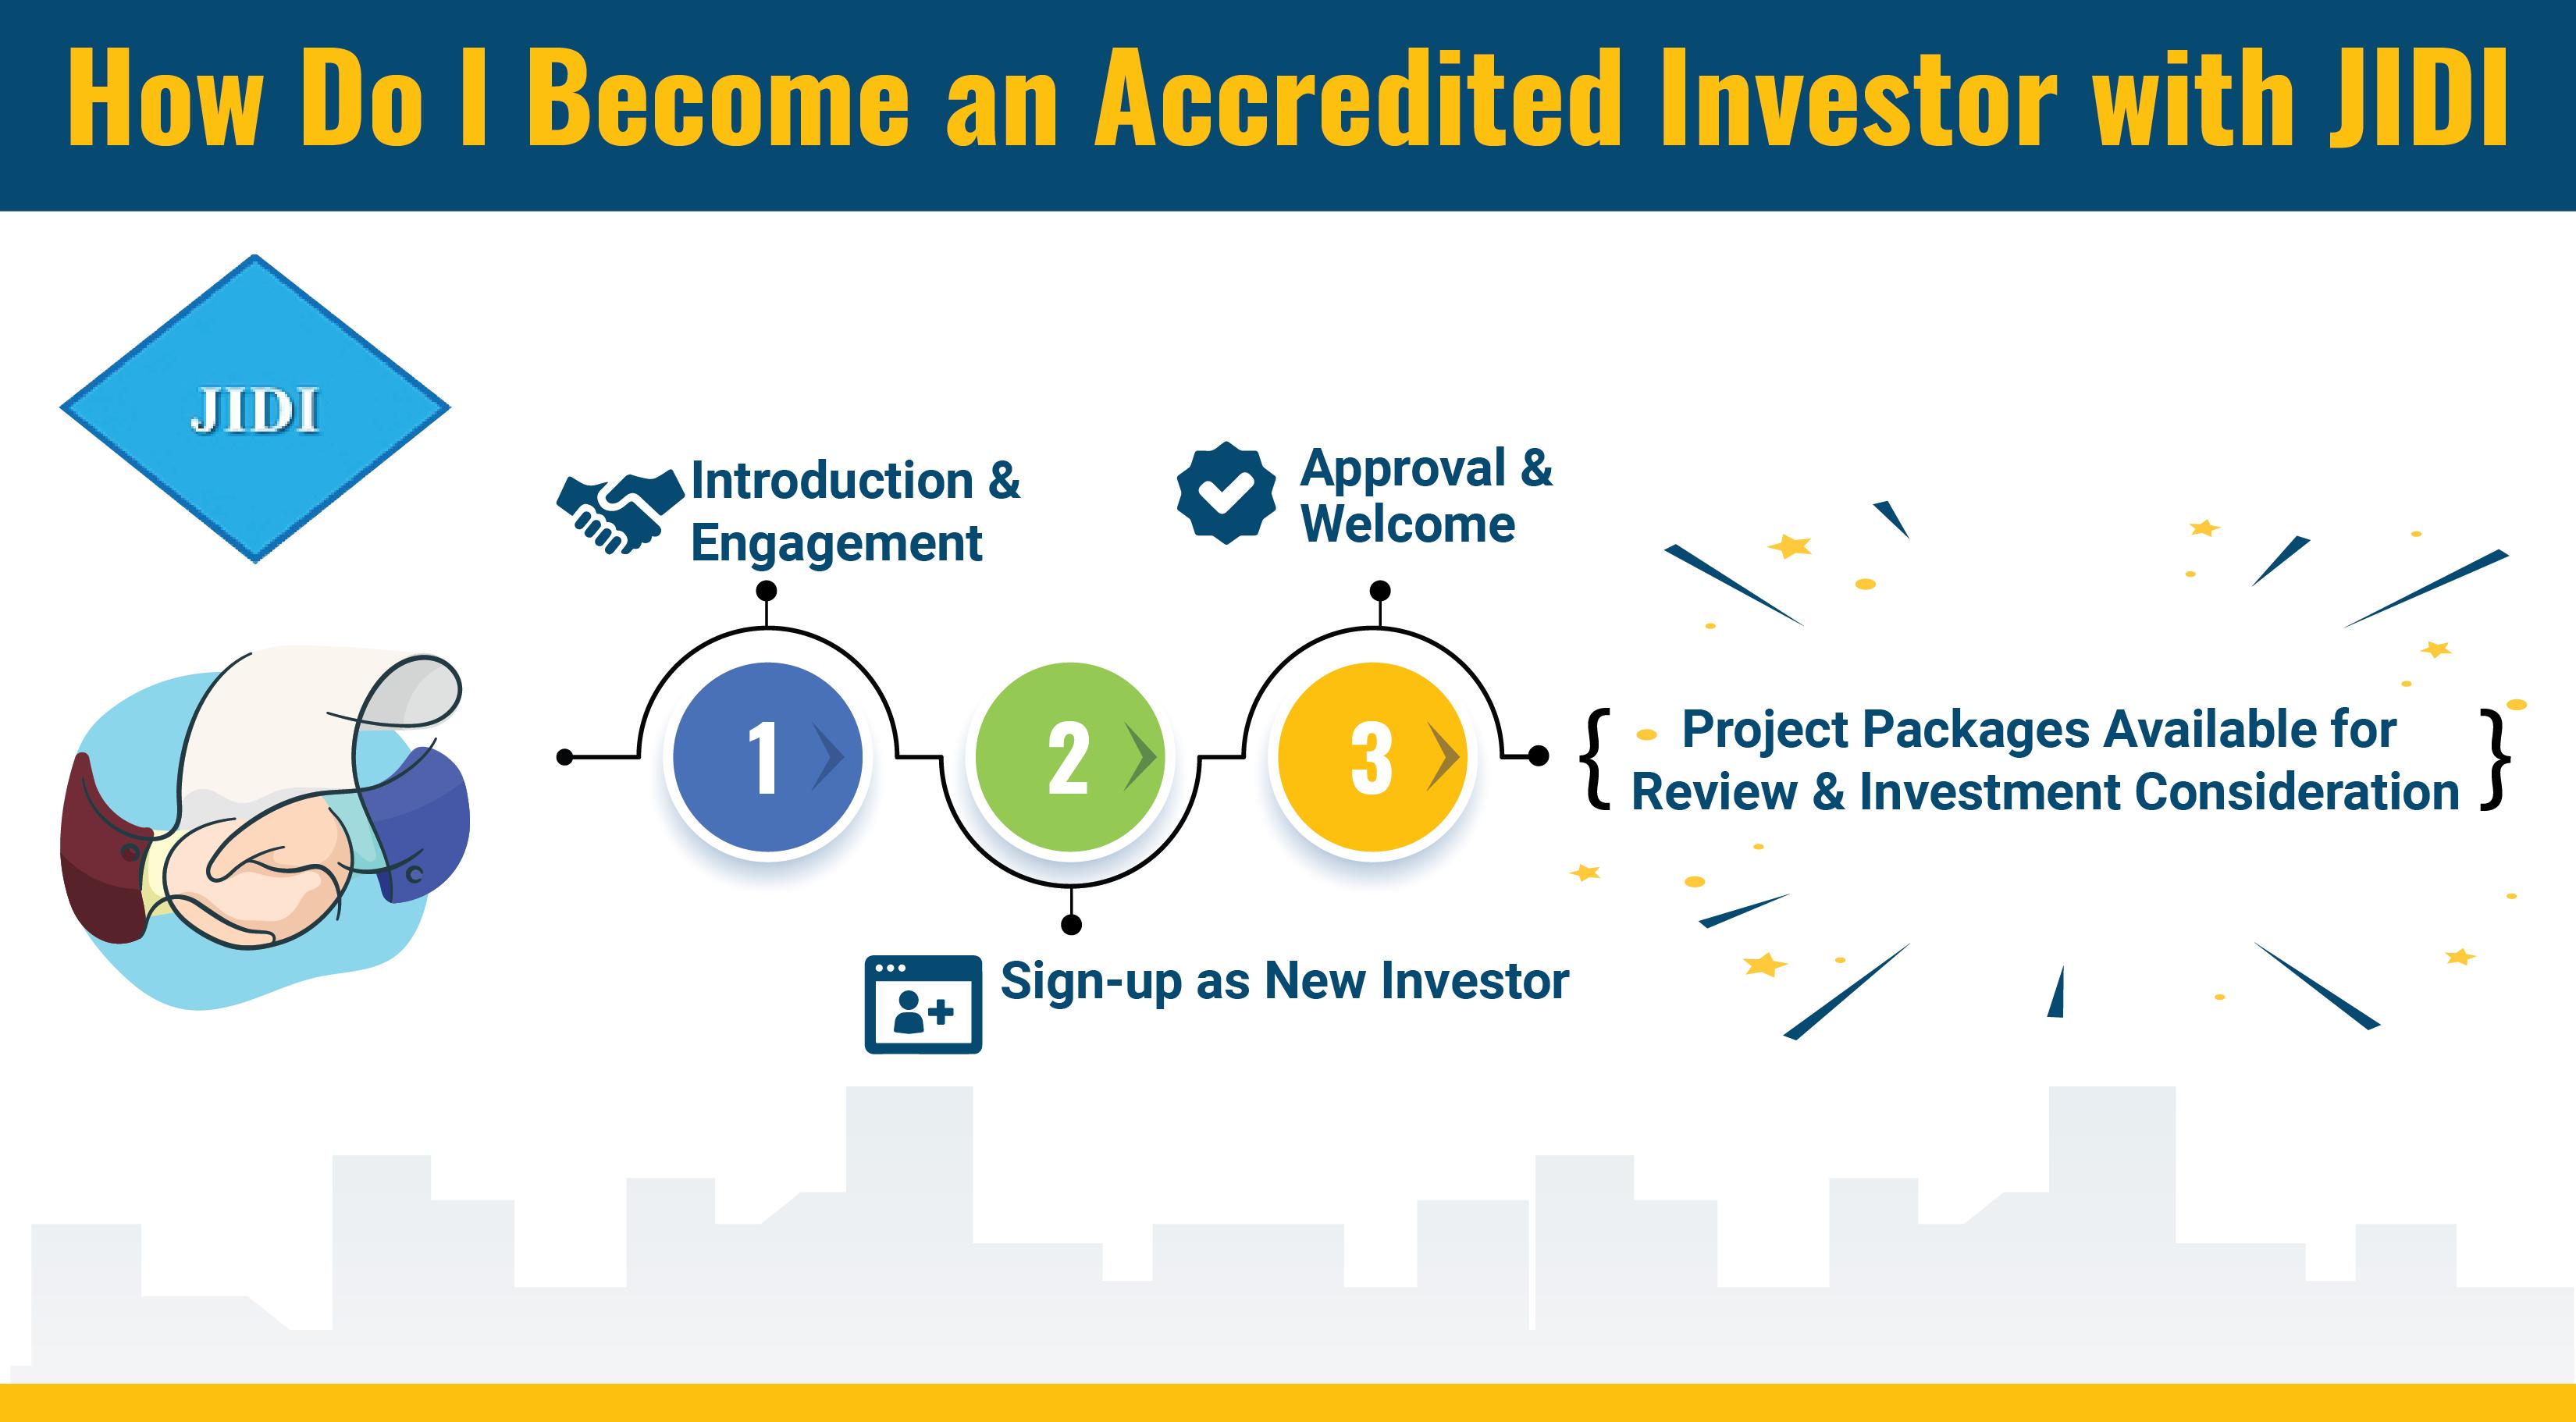 JIDI accredited investor